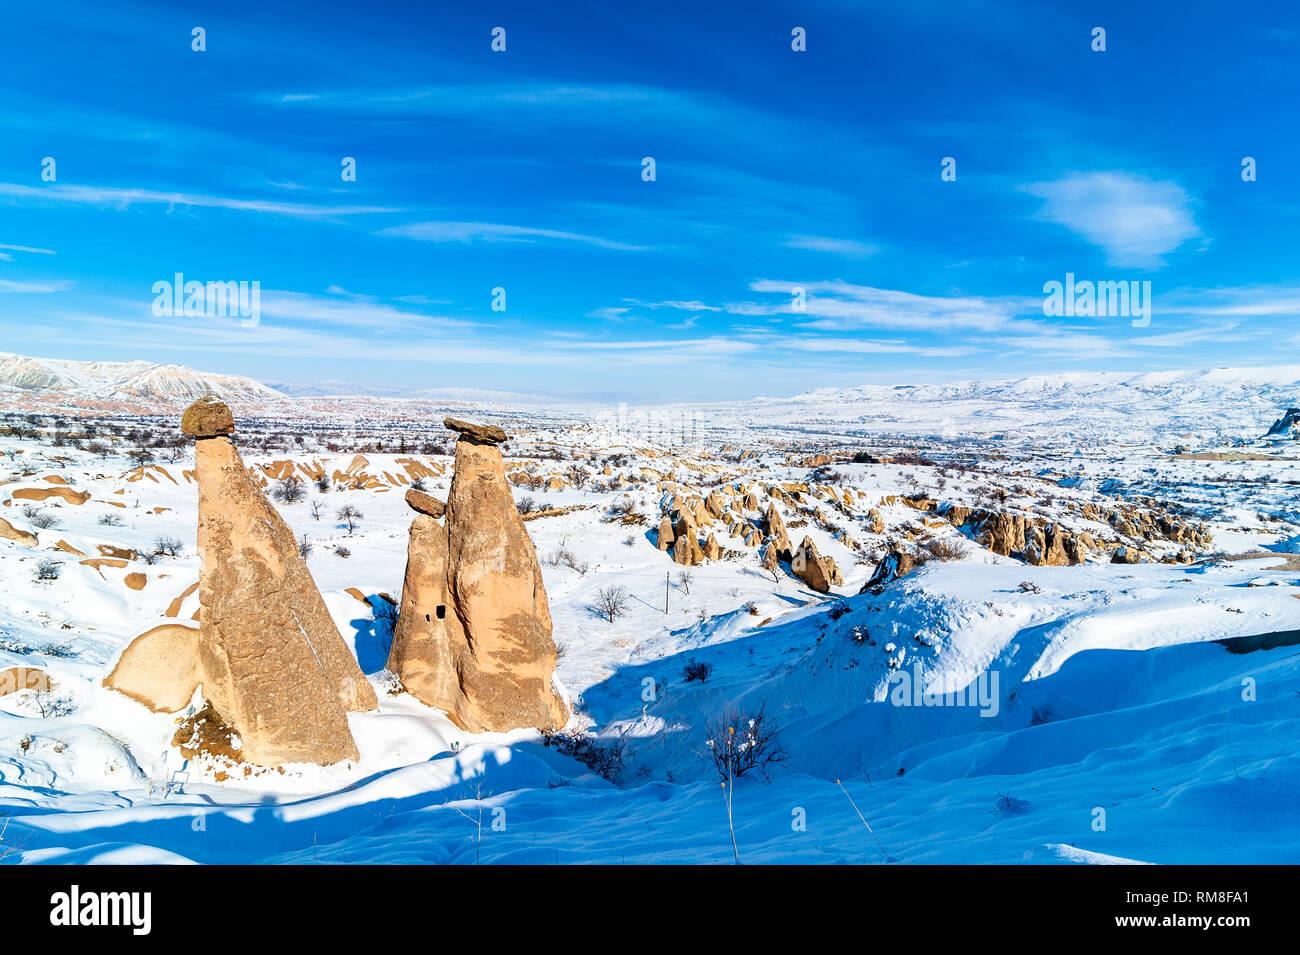 Snowy winter time at three Graces, three Beautifuls (uc guzeller) rock hills in Devrent valley Cappadocia, Nevsehir, Turkey - Stock Image